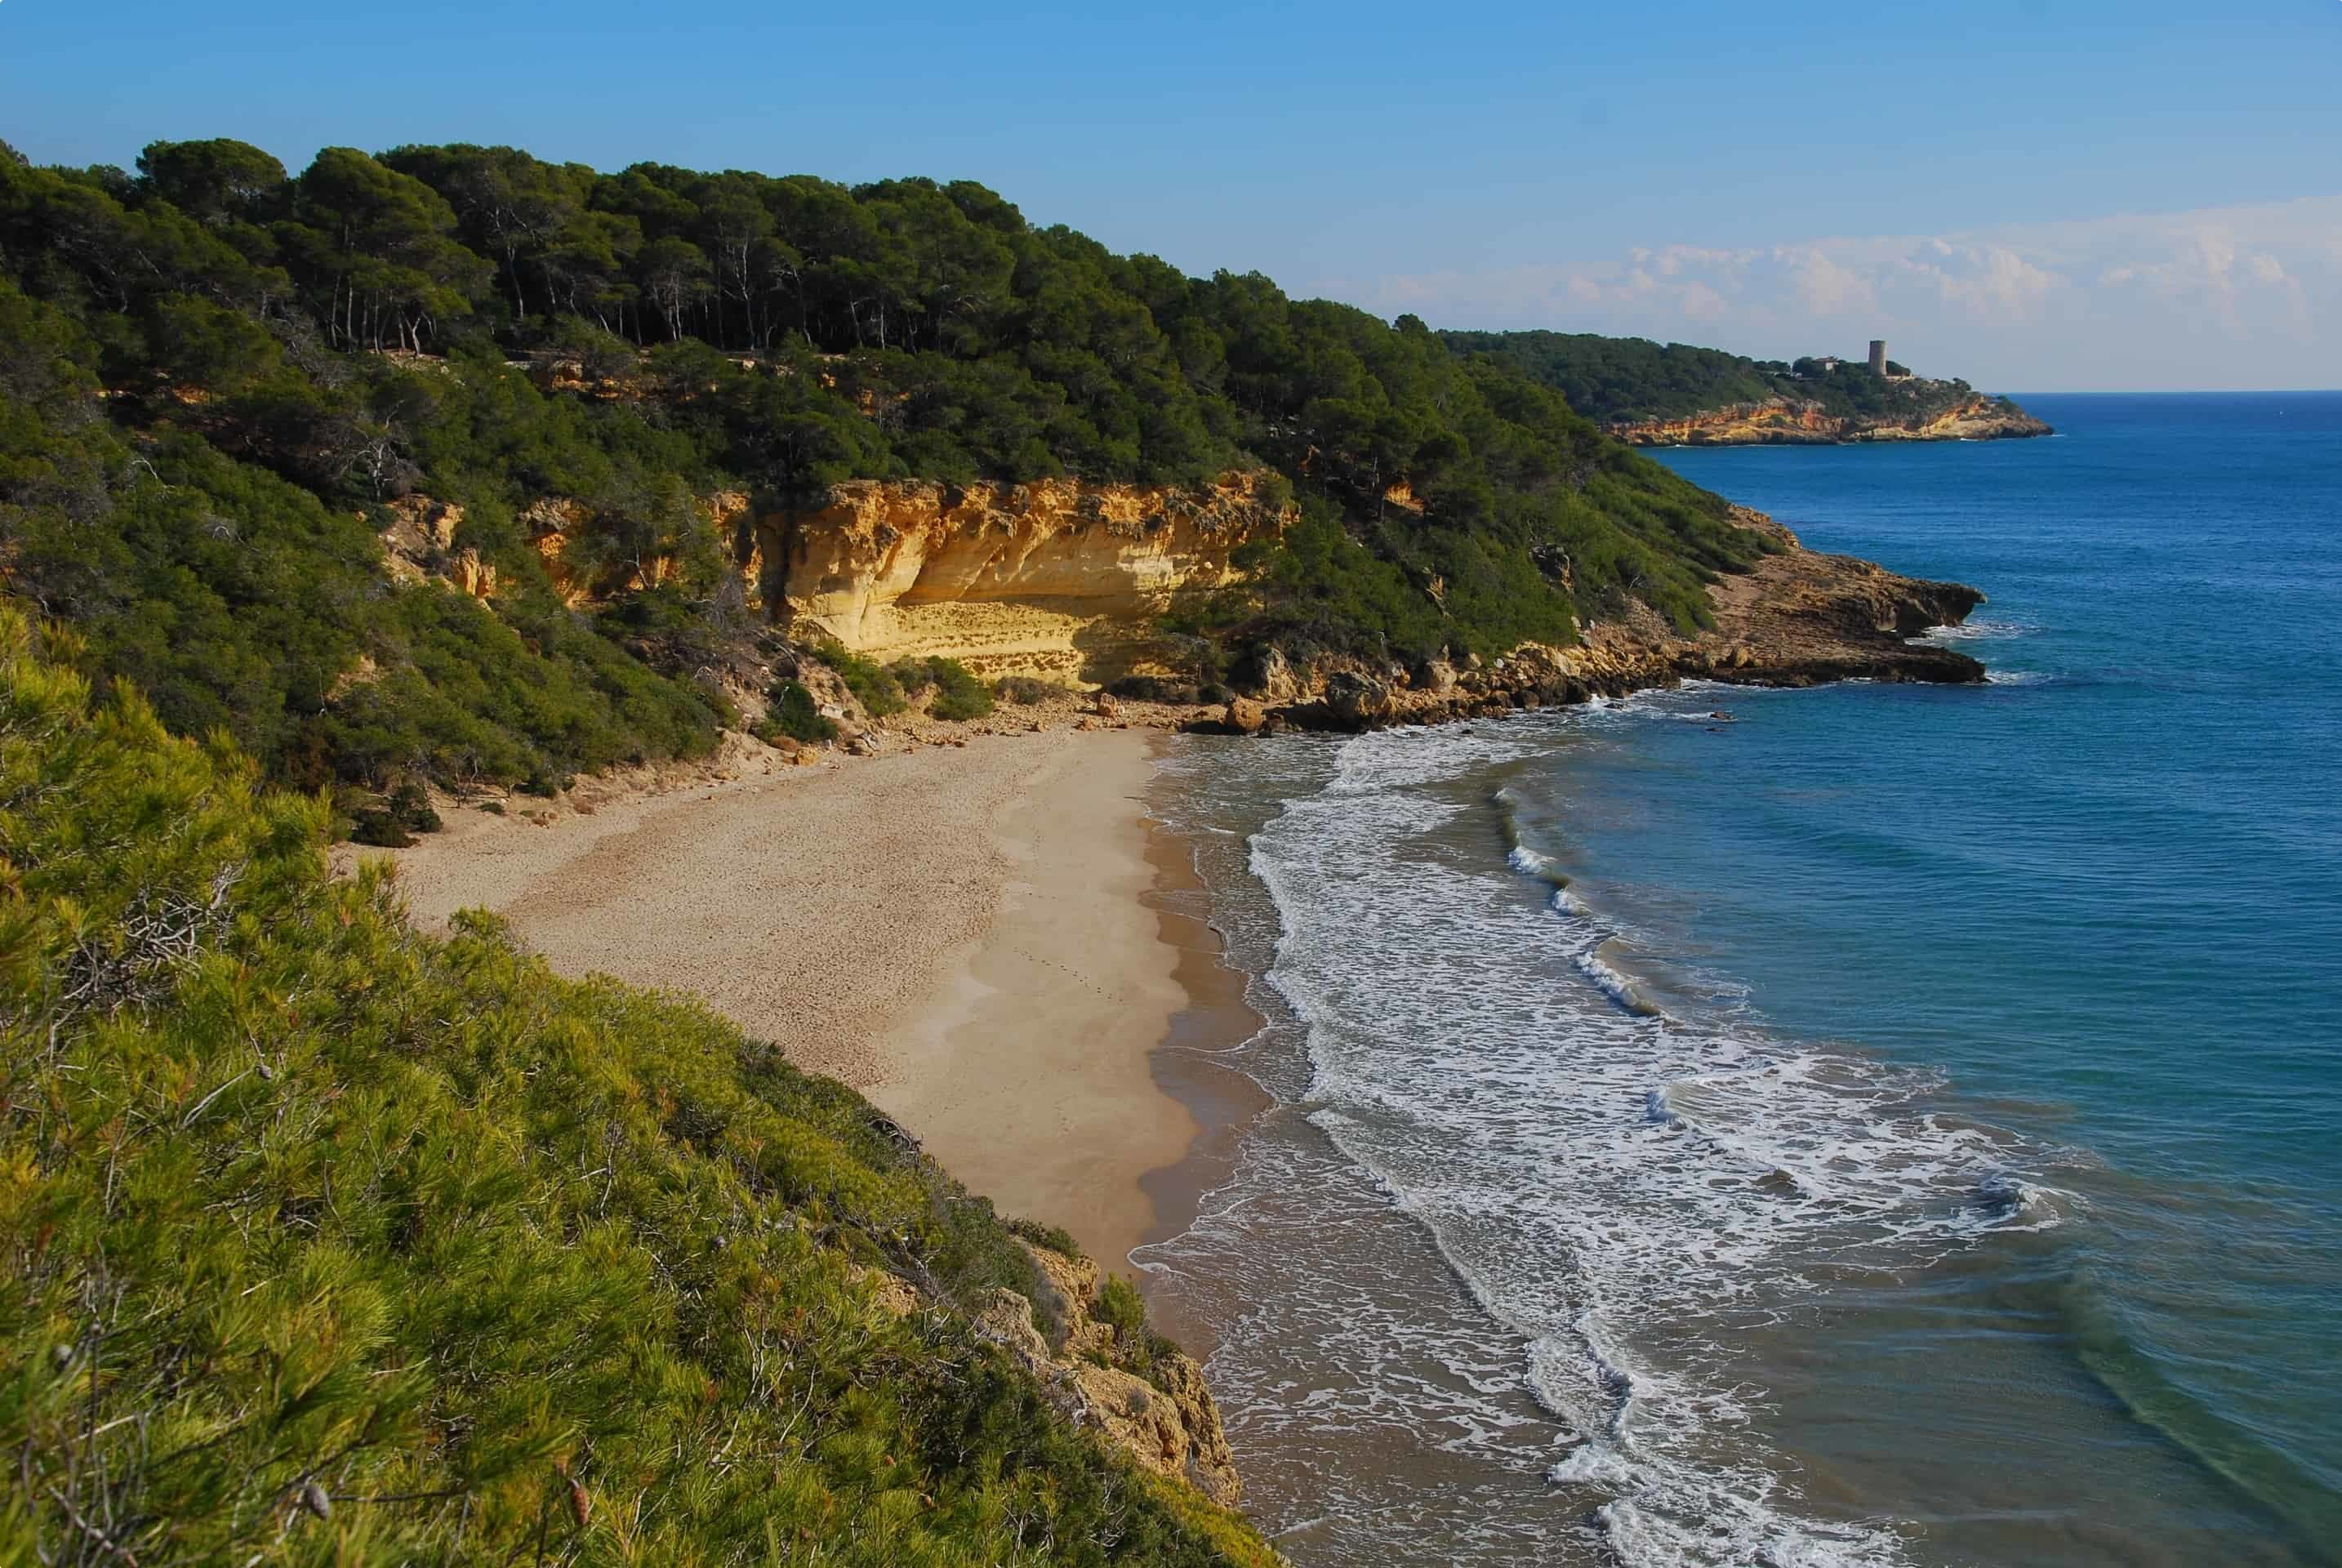 The secluded beach of Cala Fonda, near Tarragona